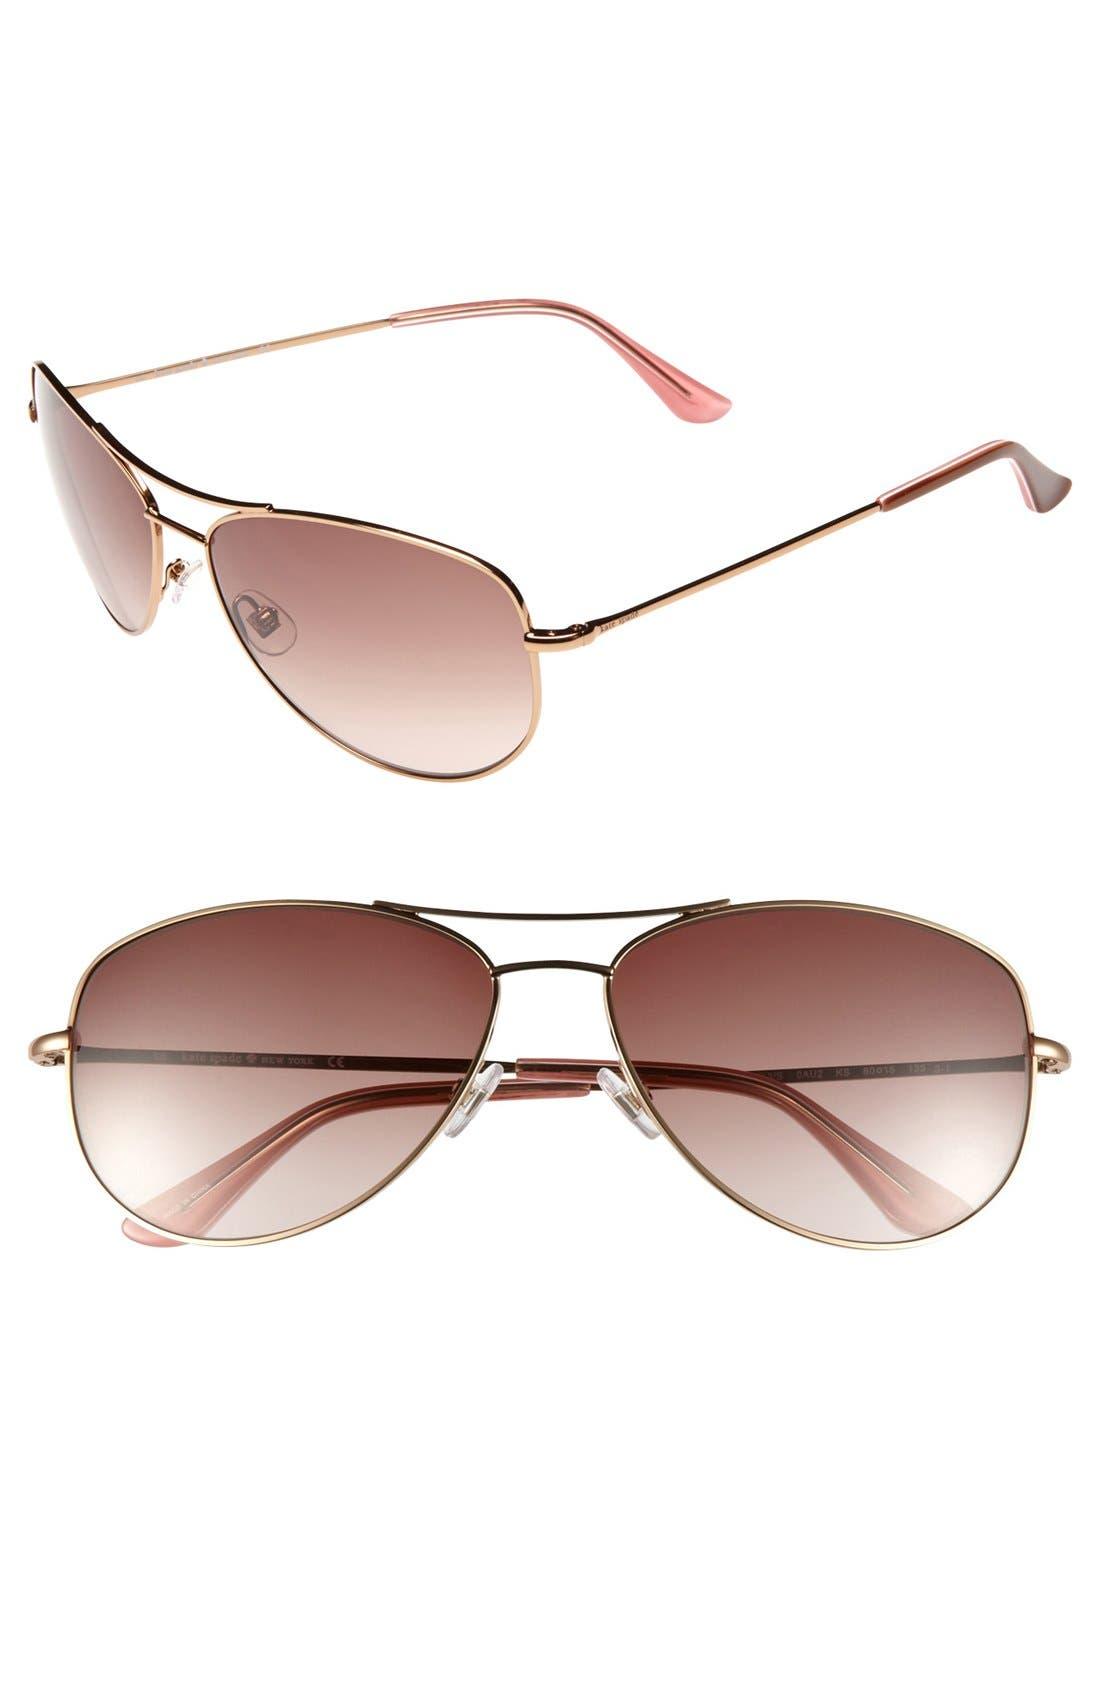 Alternate Image 1 Selected - kate spade new york 'ally 3' 60mm aviator sunglasses